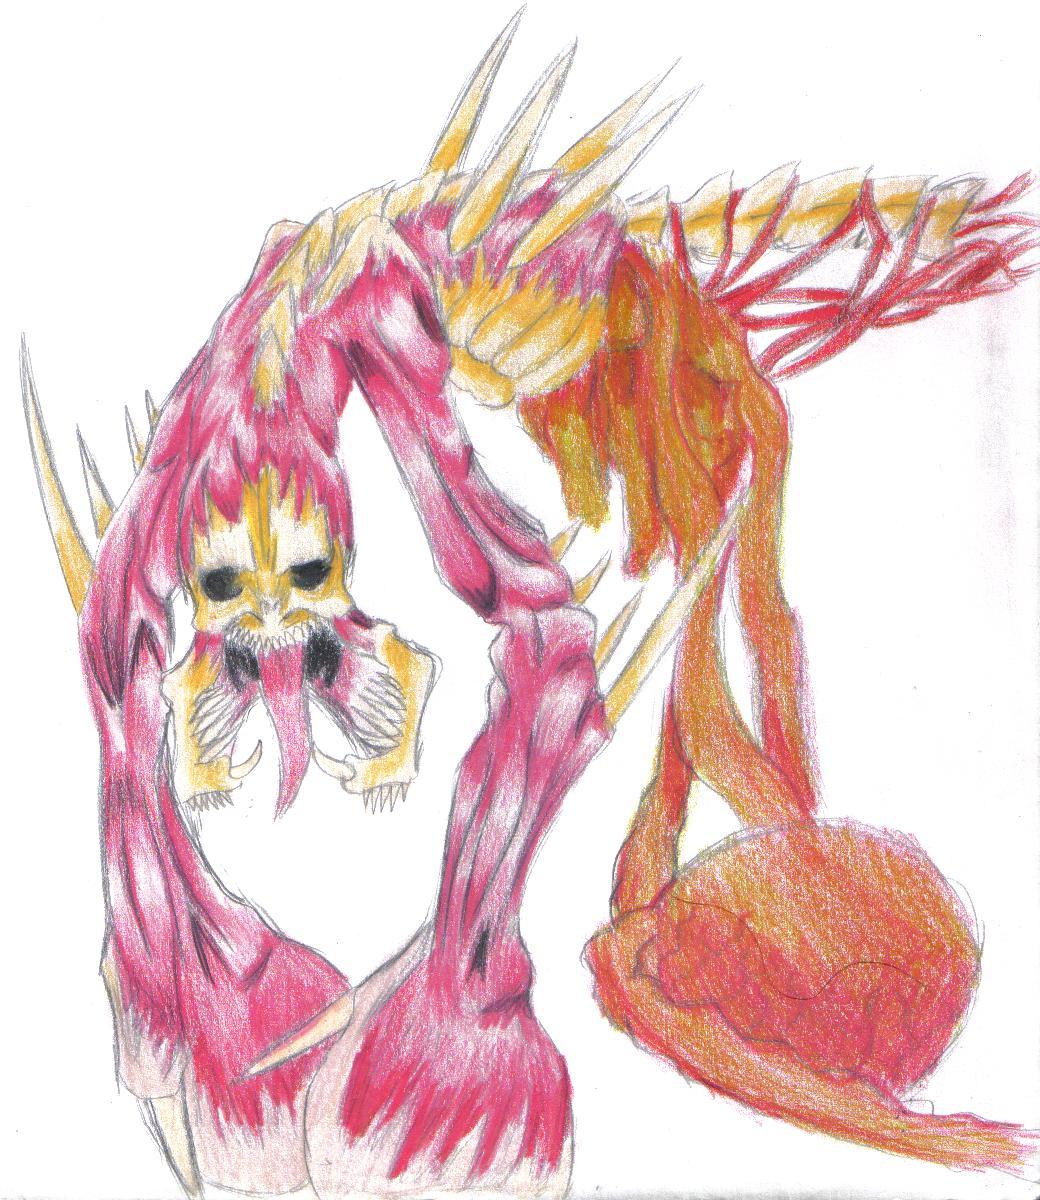 a picture i colored